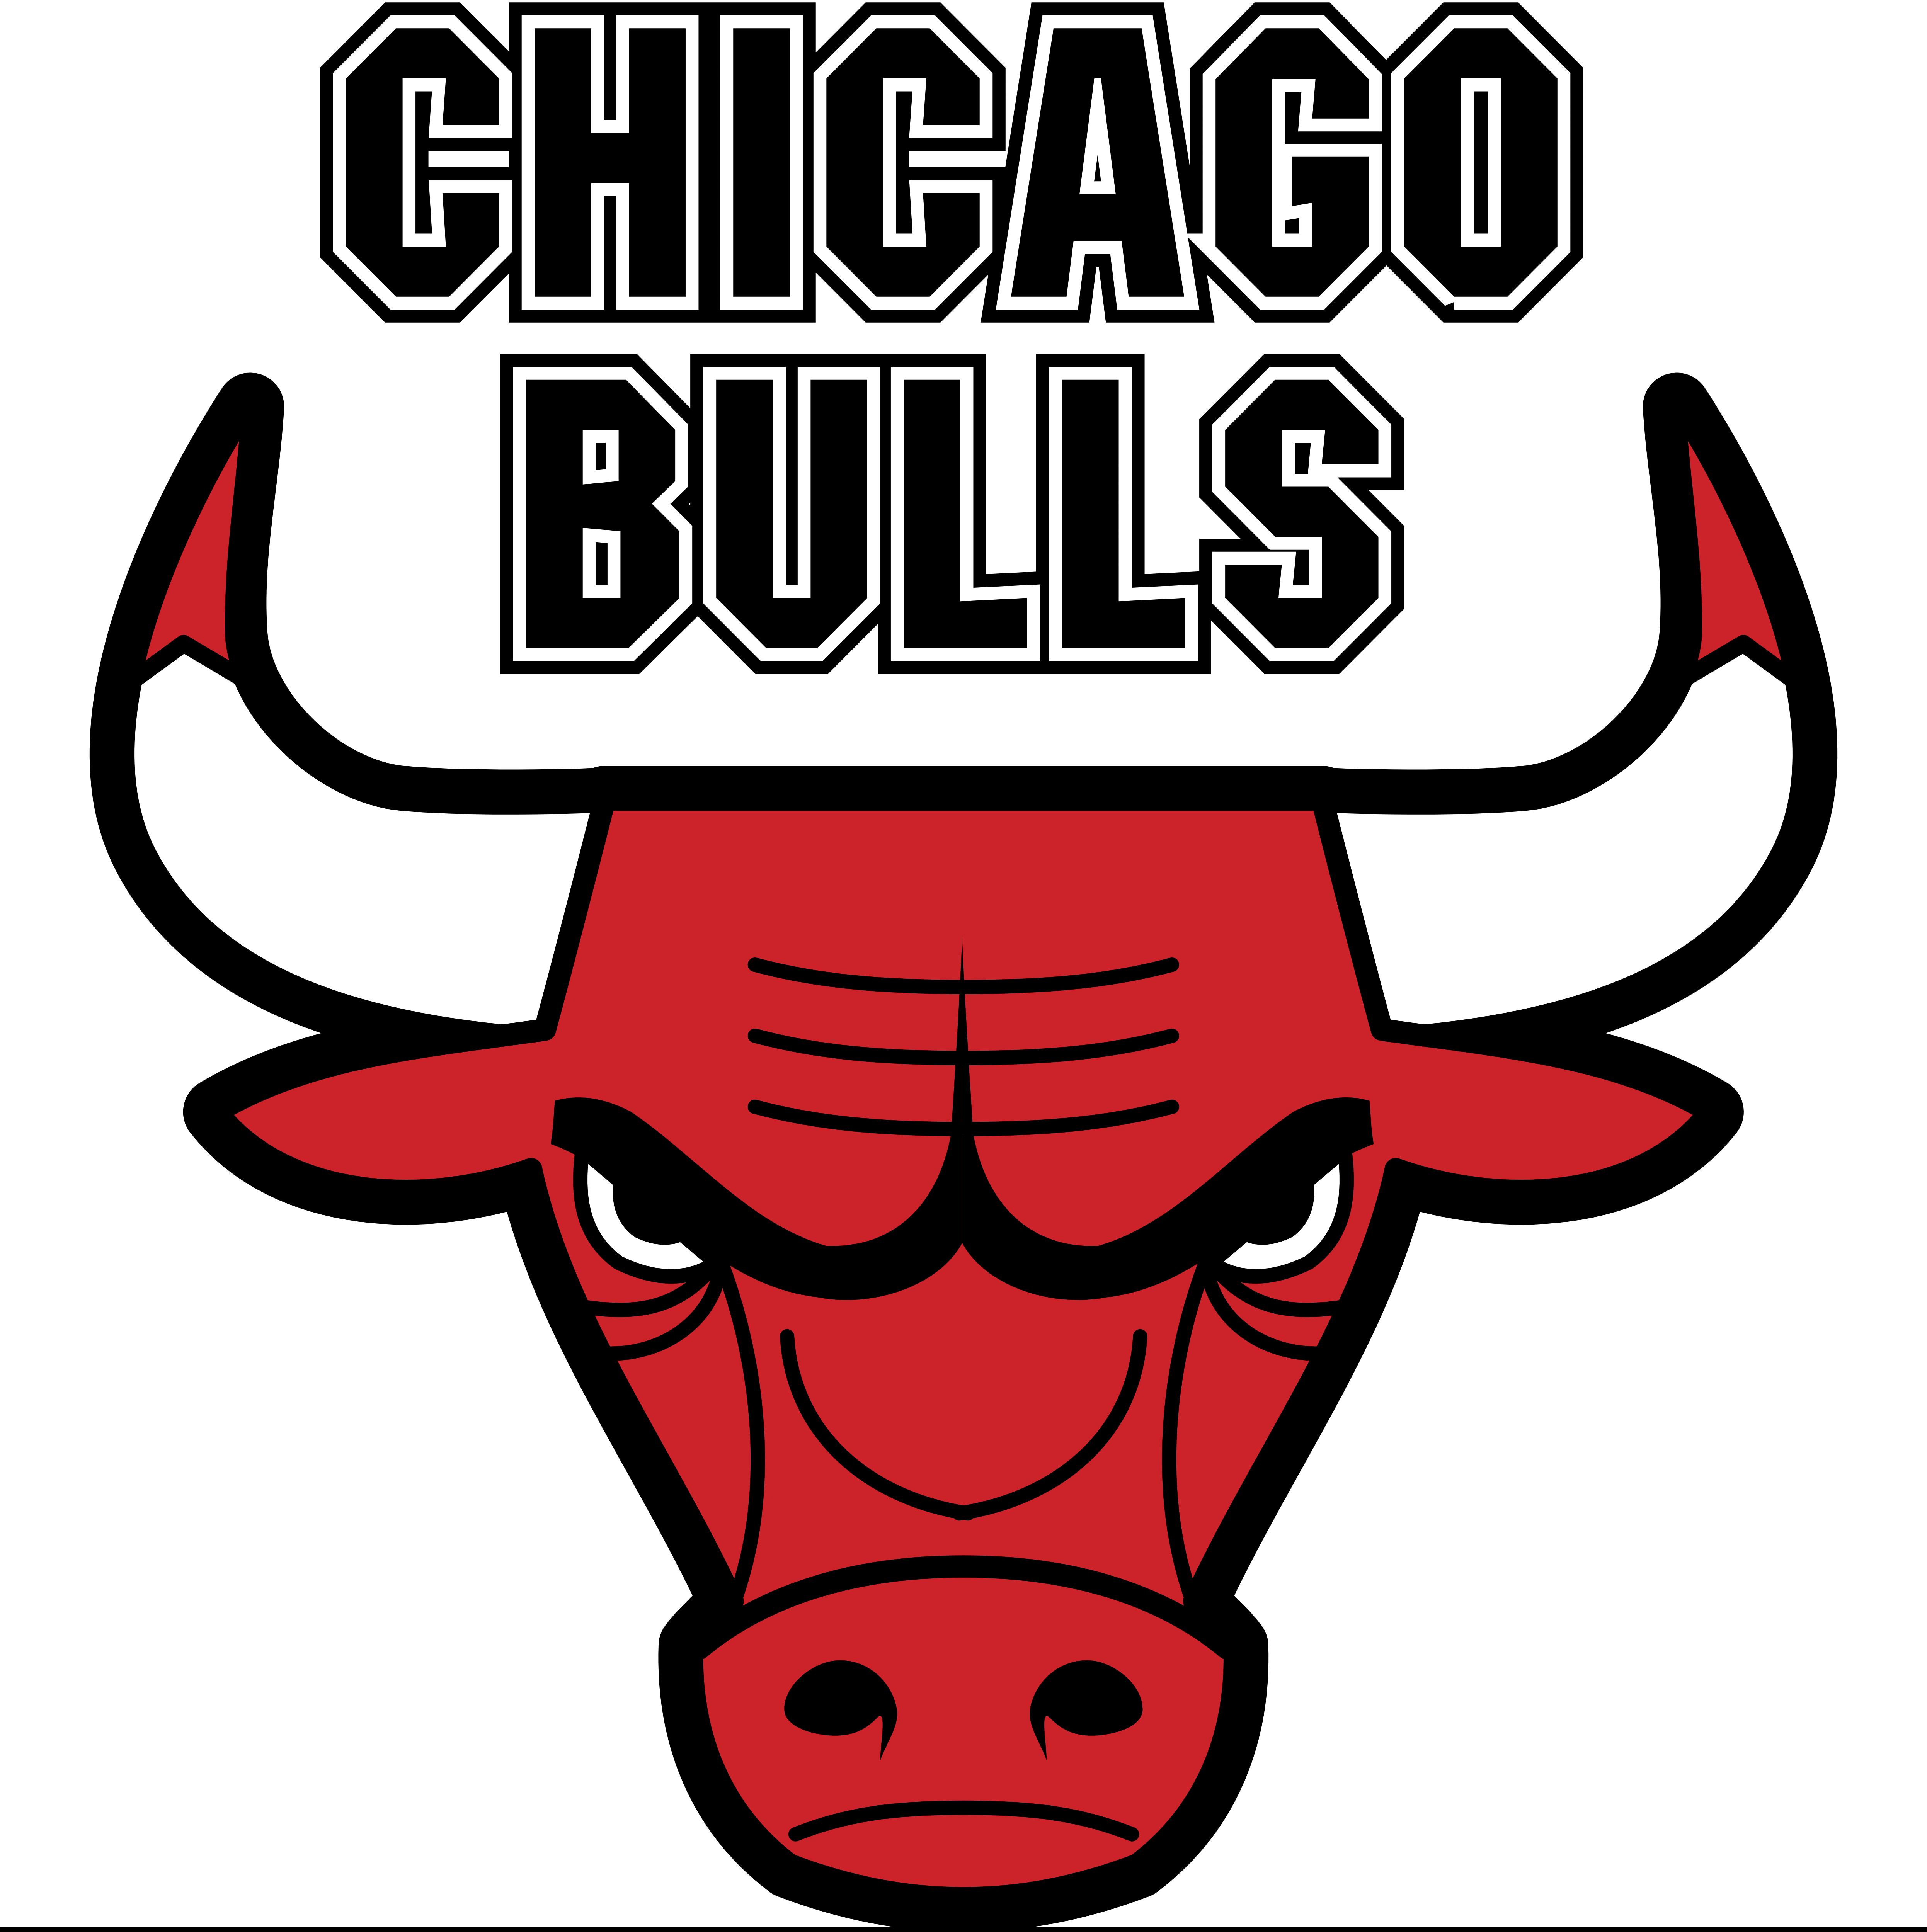 Chicago Bulls Logos Download